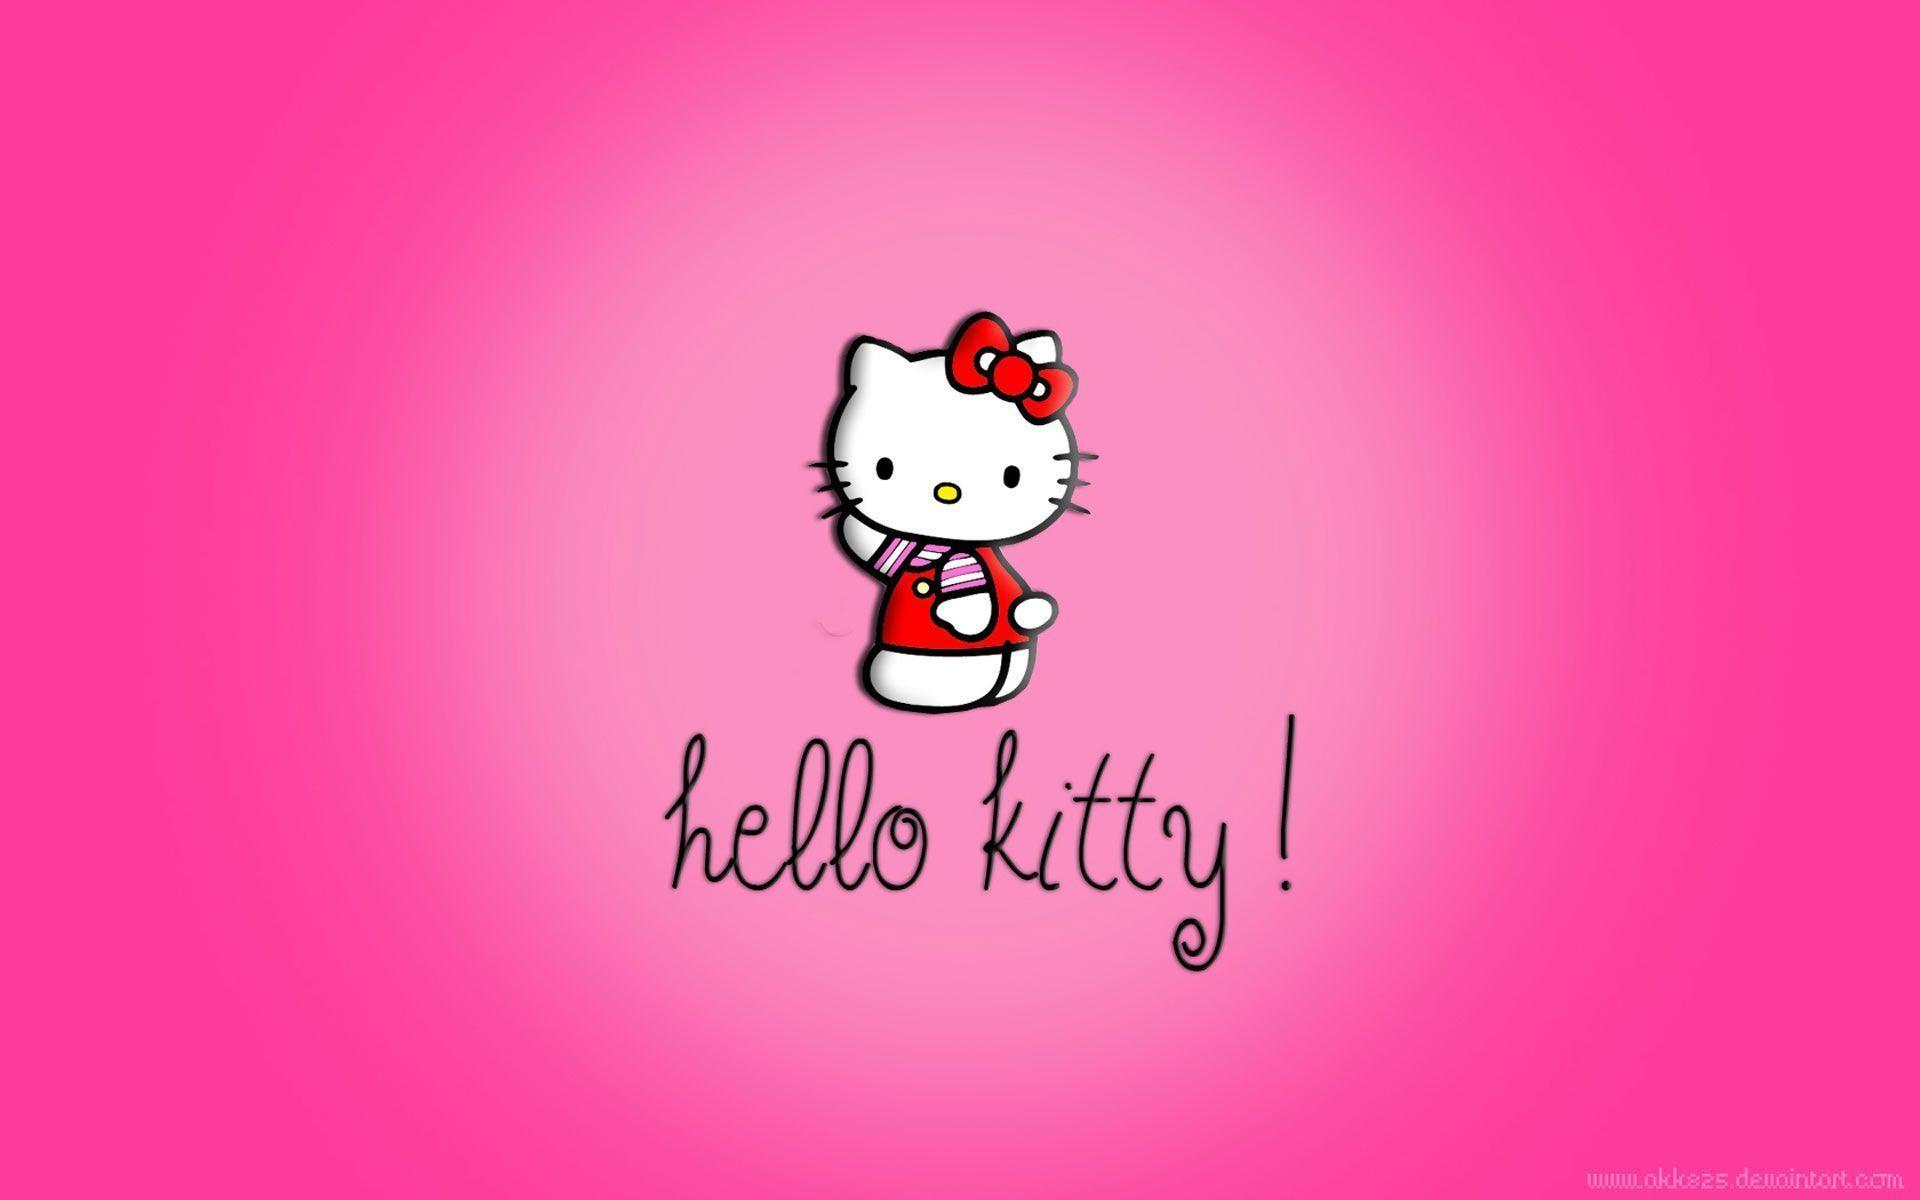 hd wallpaper kitty - photo #17